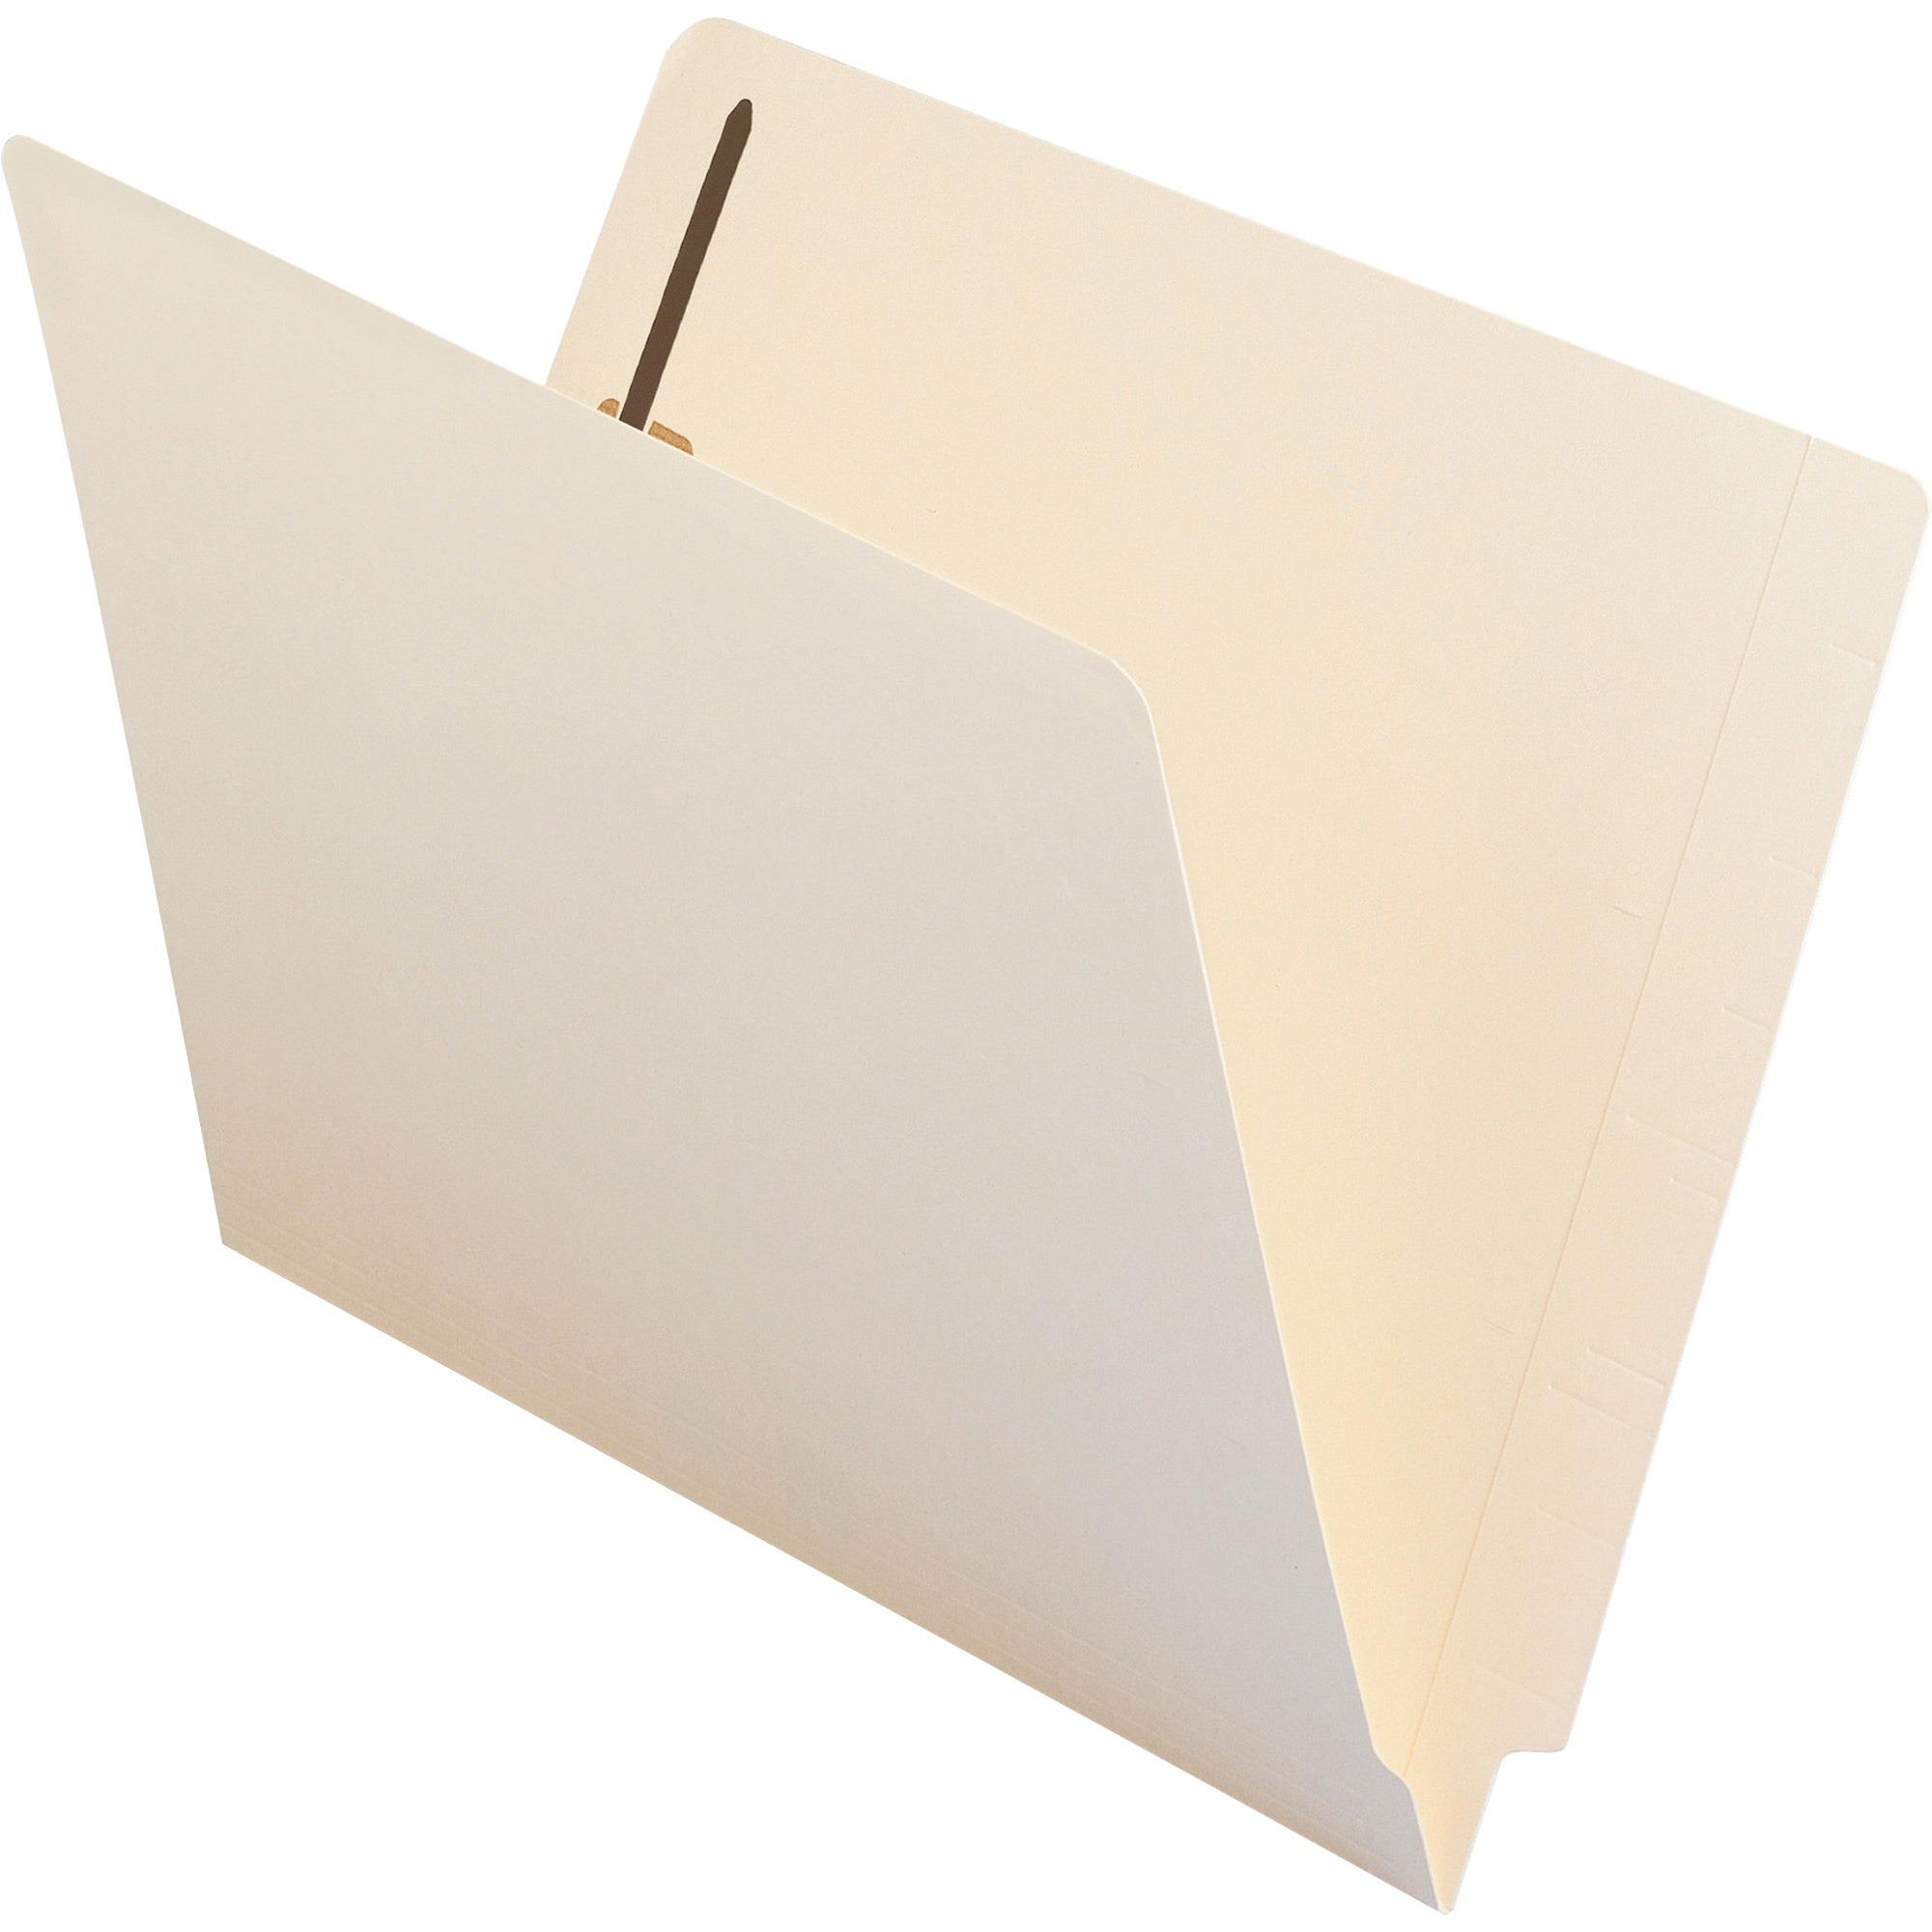 Smead End Tab Fastener File Folder, Shelf-Master® Reinforced Straight-Cut Tab, 2 Fasteners, Letter Size, Manila, 50 per Box (34115)